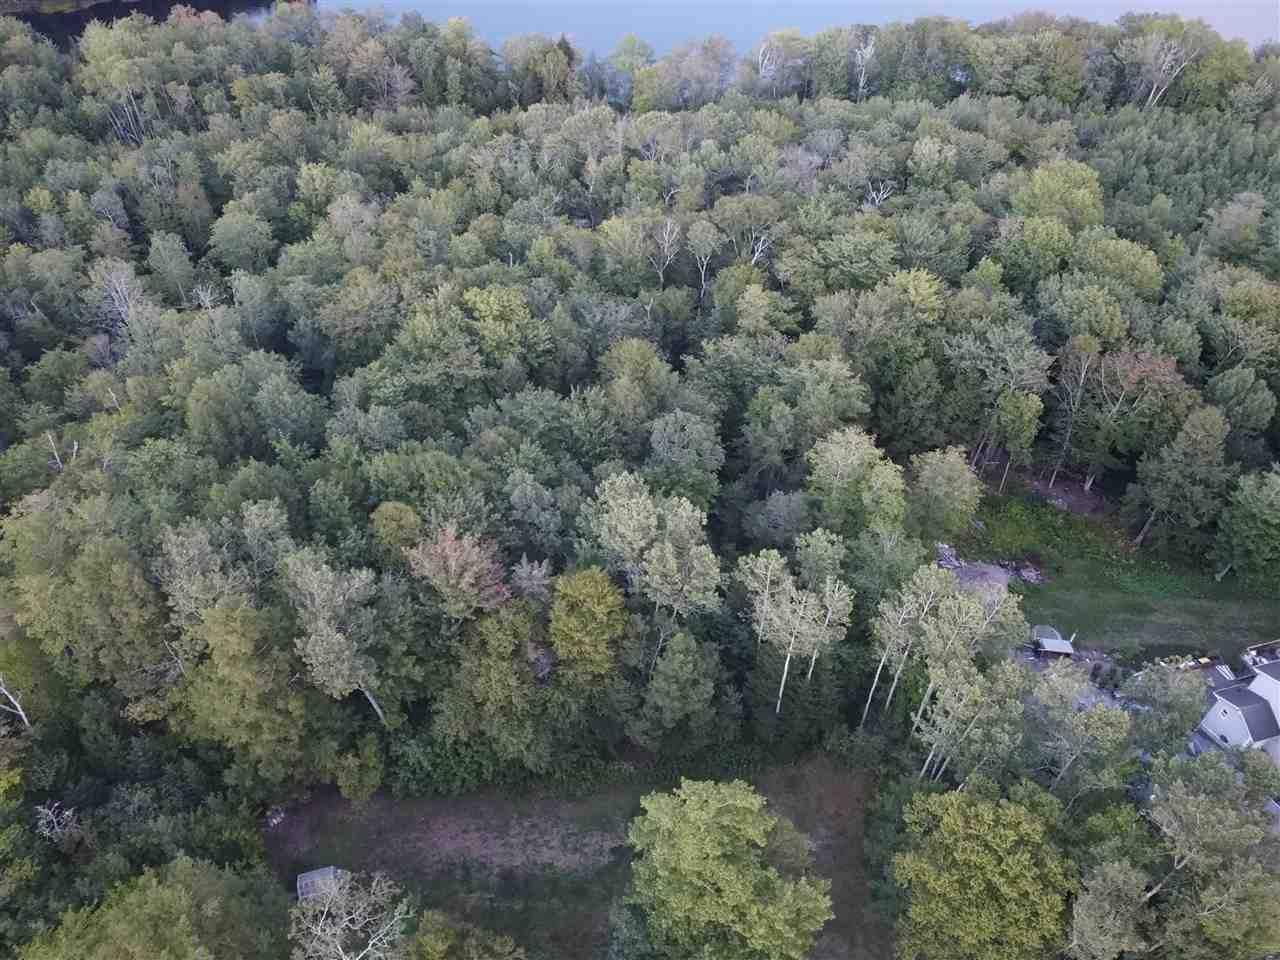 Main Photo: 38 Pepperbush Court in Middle Sackville: 26-Beaverbank, Upper Sackville Vacant Land for sale (Halifax-Dartmouth)  : MLS®# 202018387